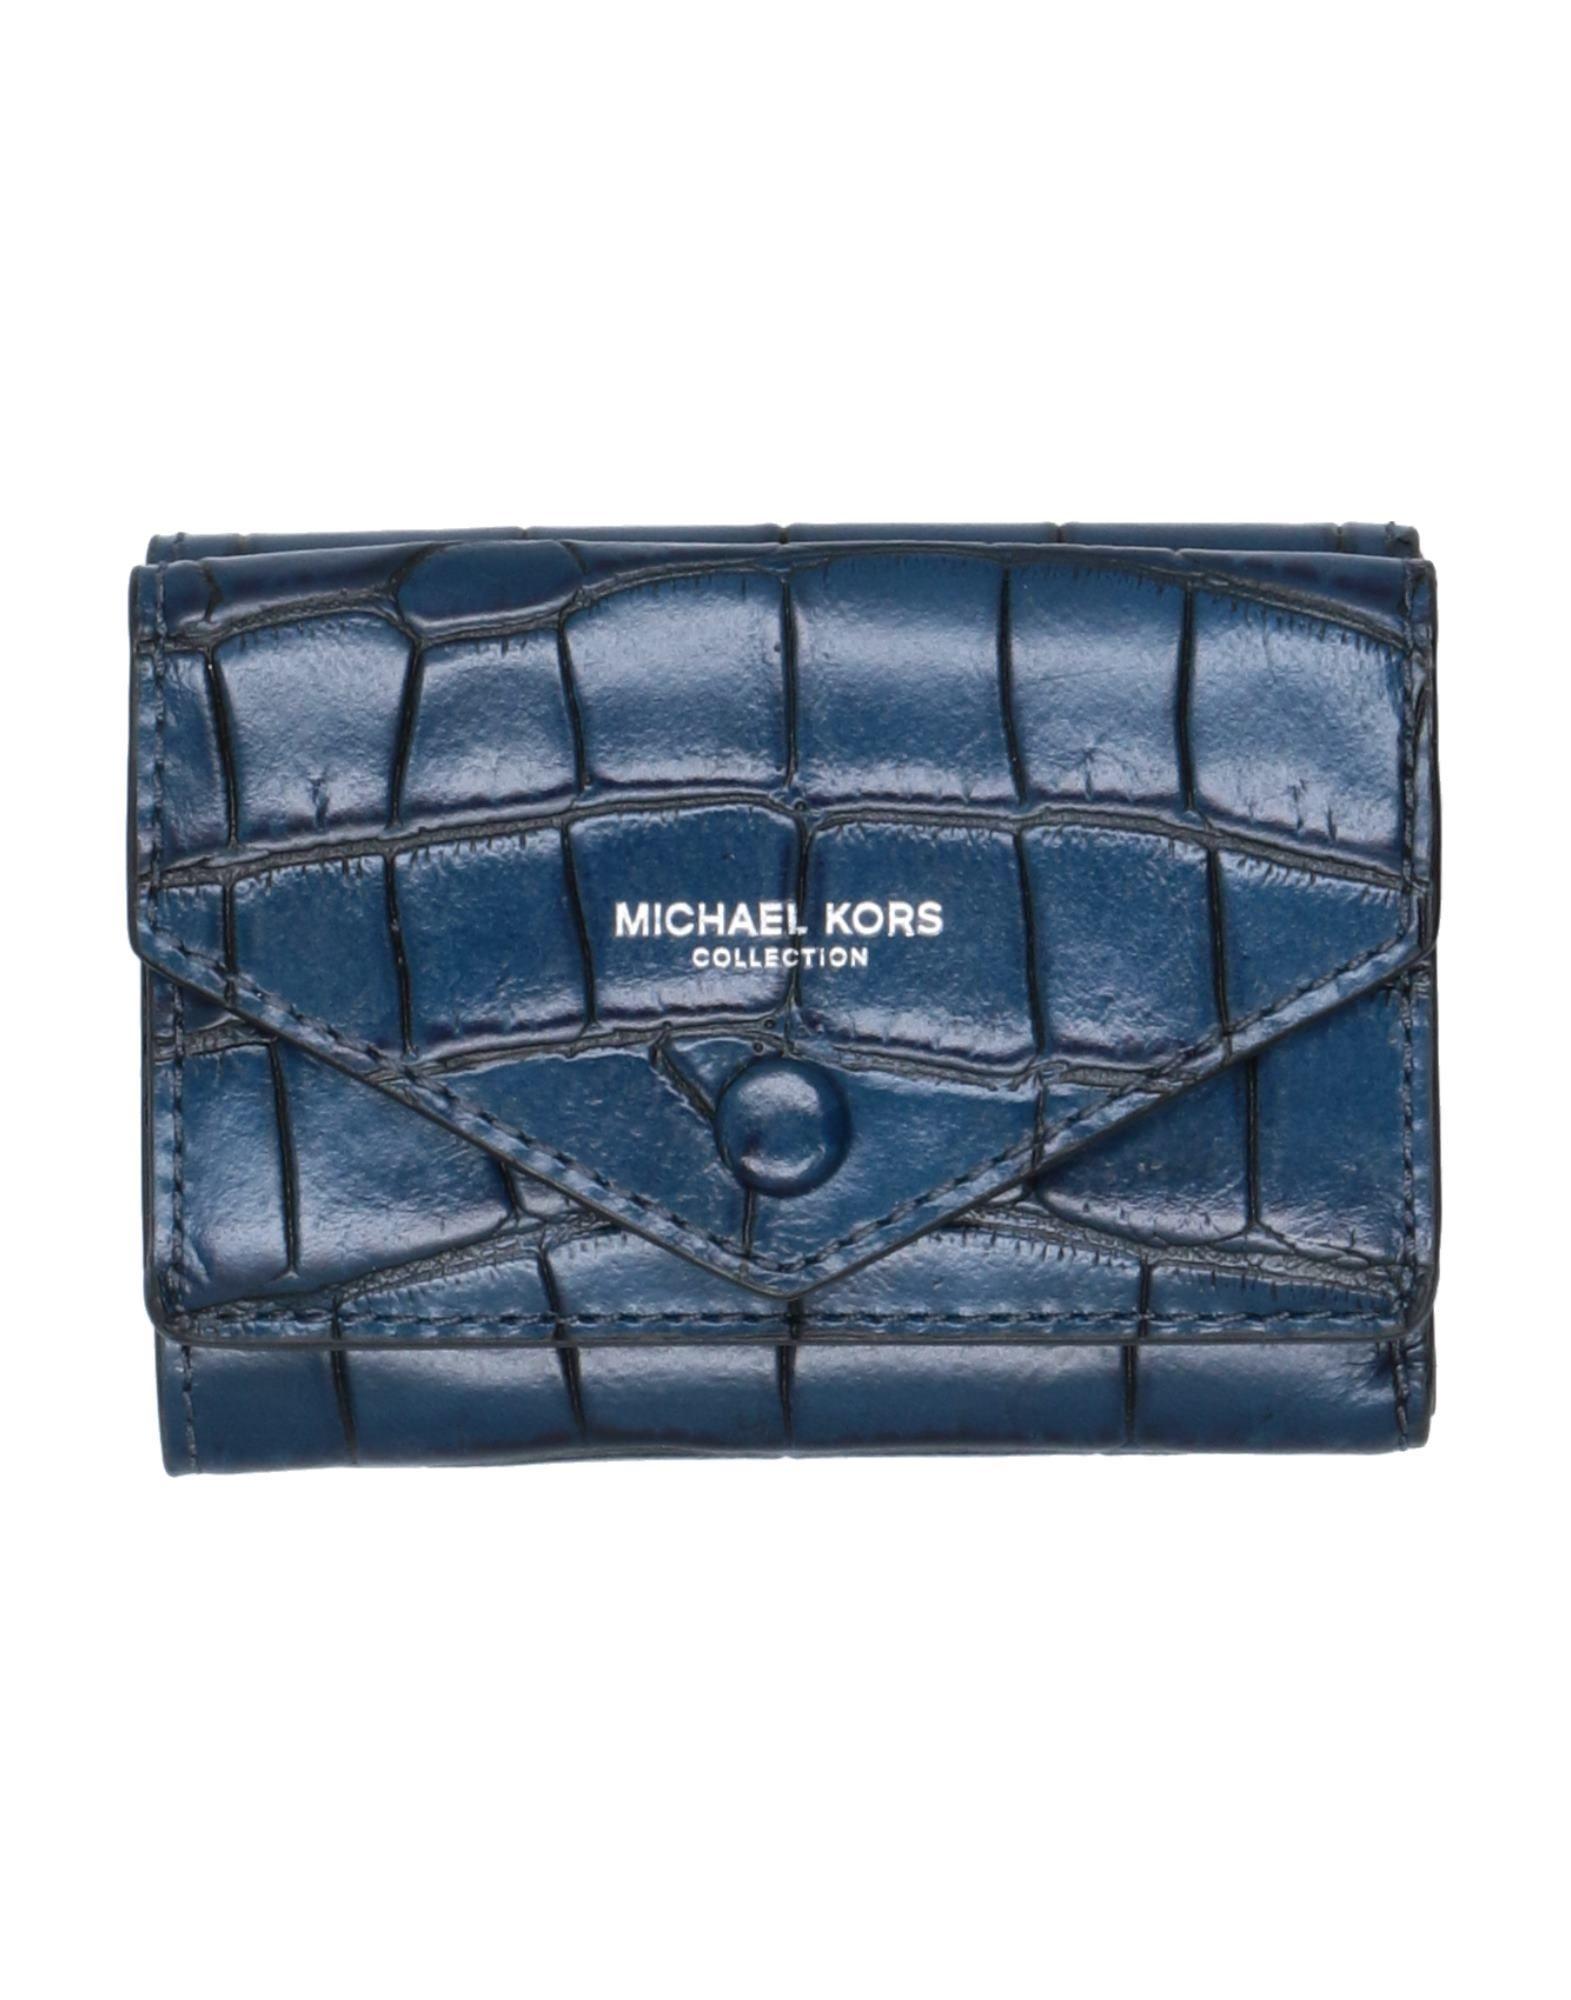 MICHAEL KORS COLLECTION マイケル・コースコレクション レディース 小銭入れ ブルー